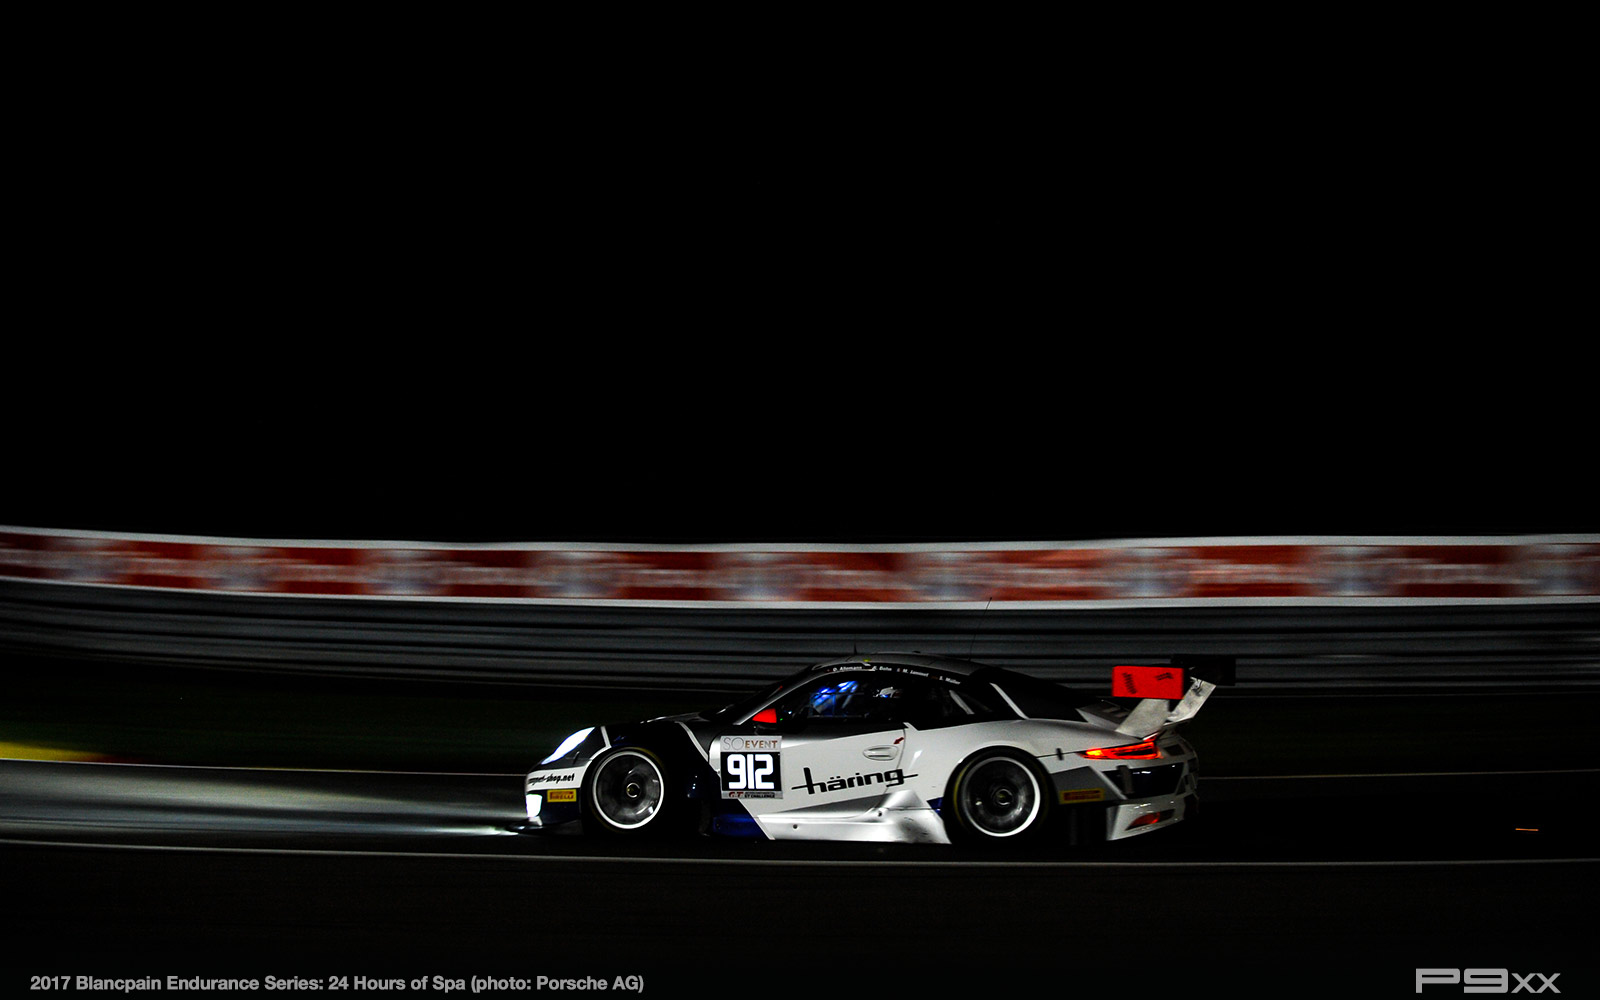 2017-24-Hours-of-Spa-Porsche-329